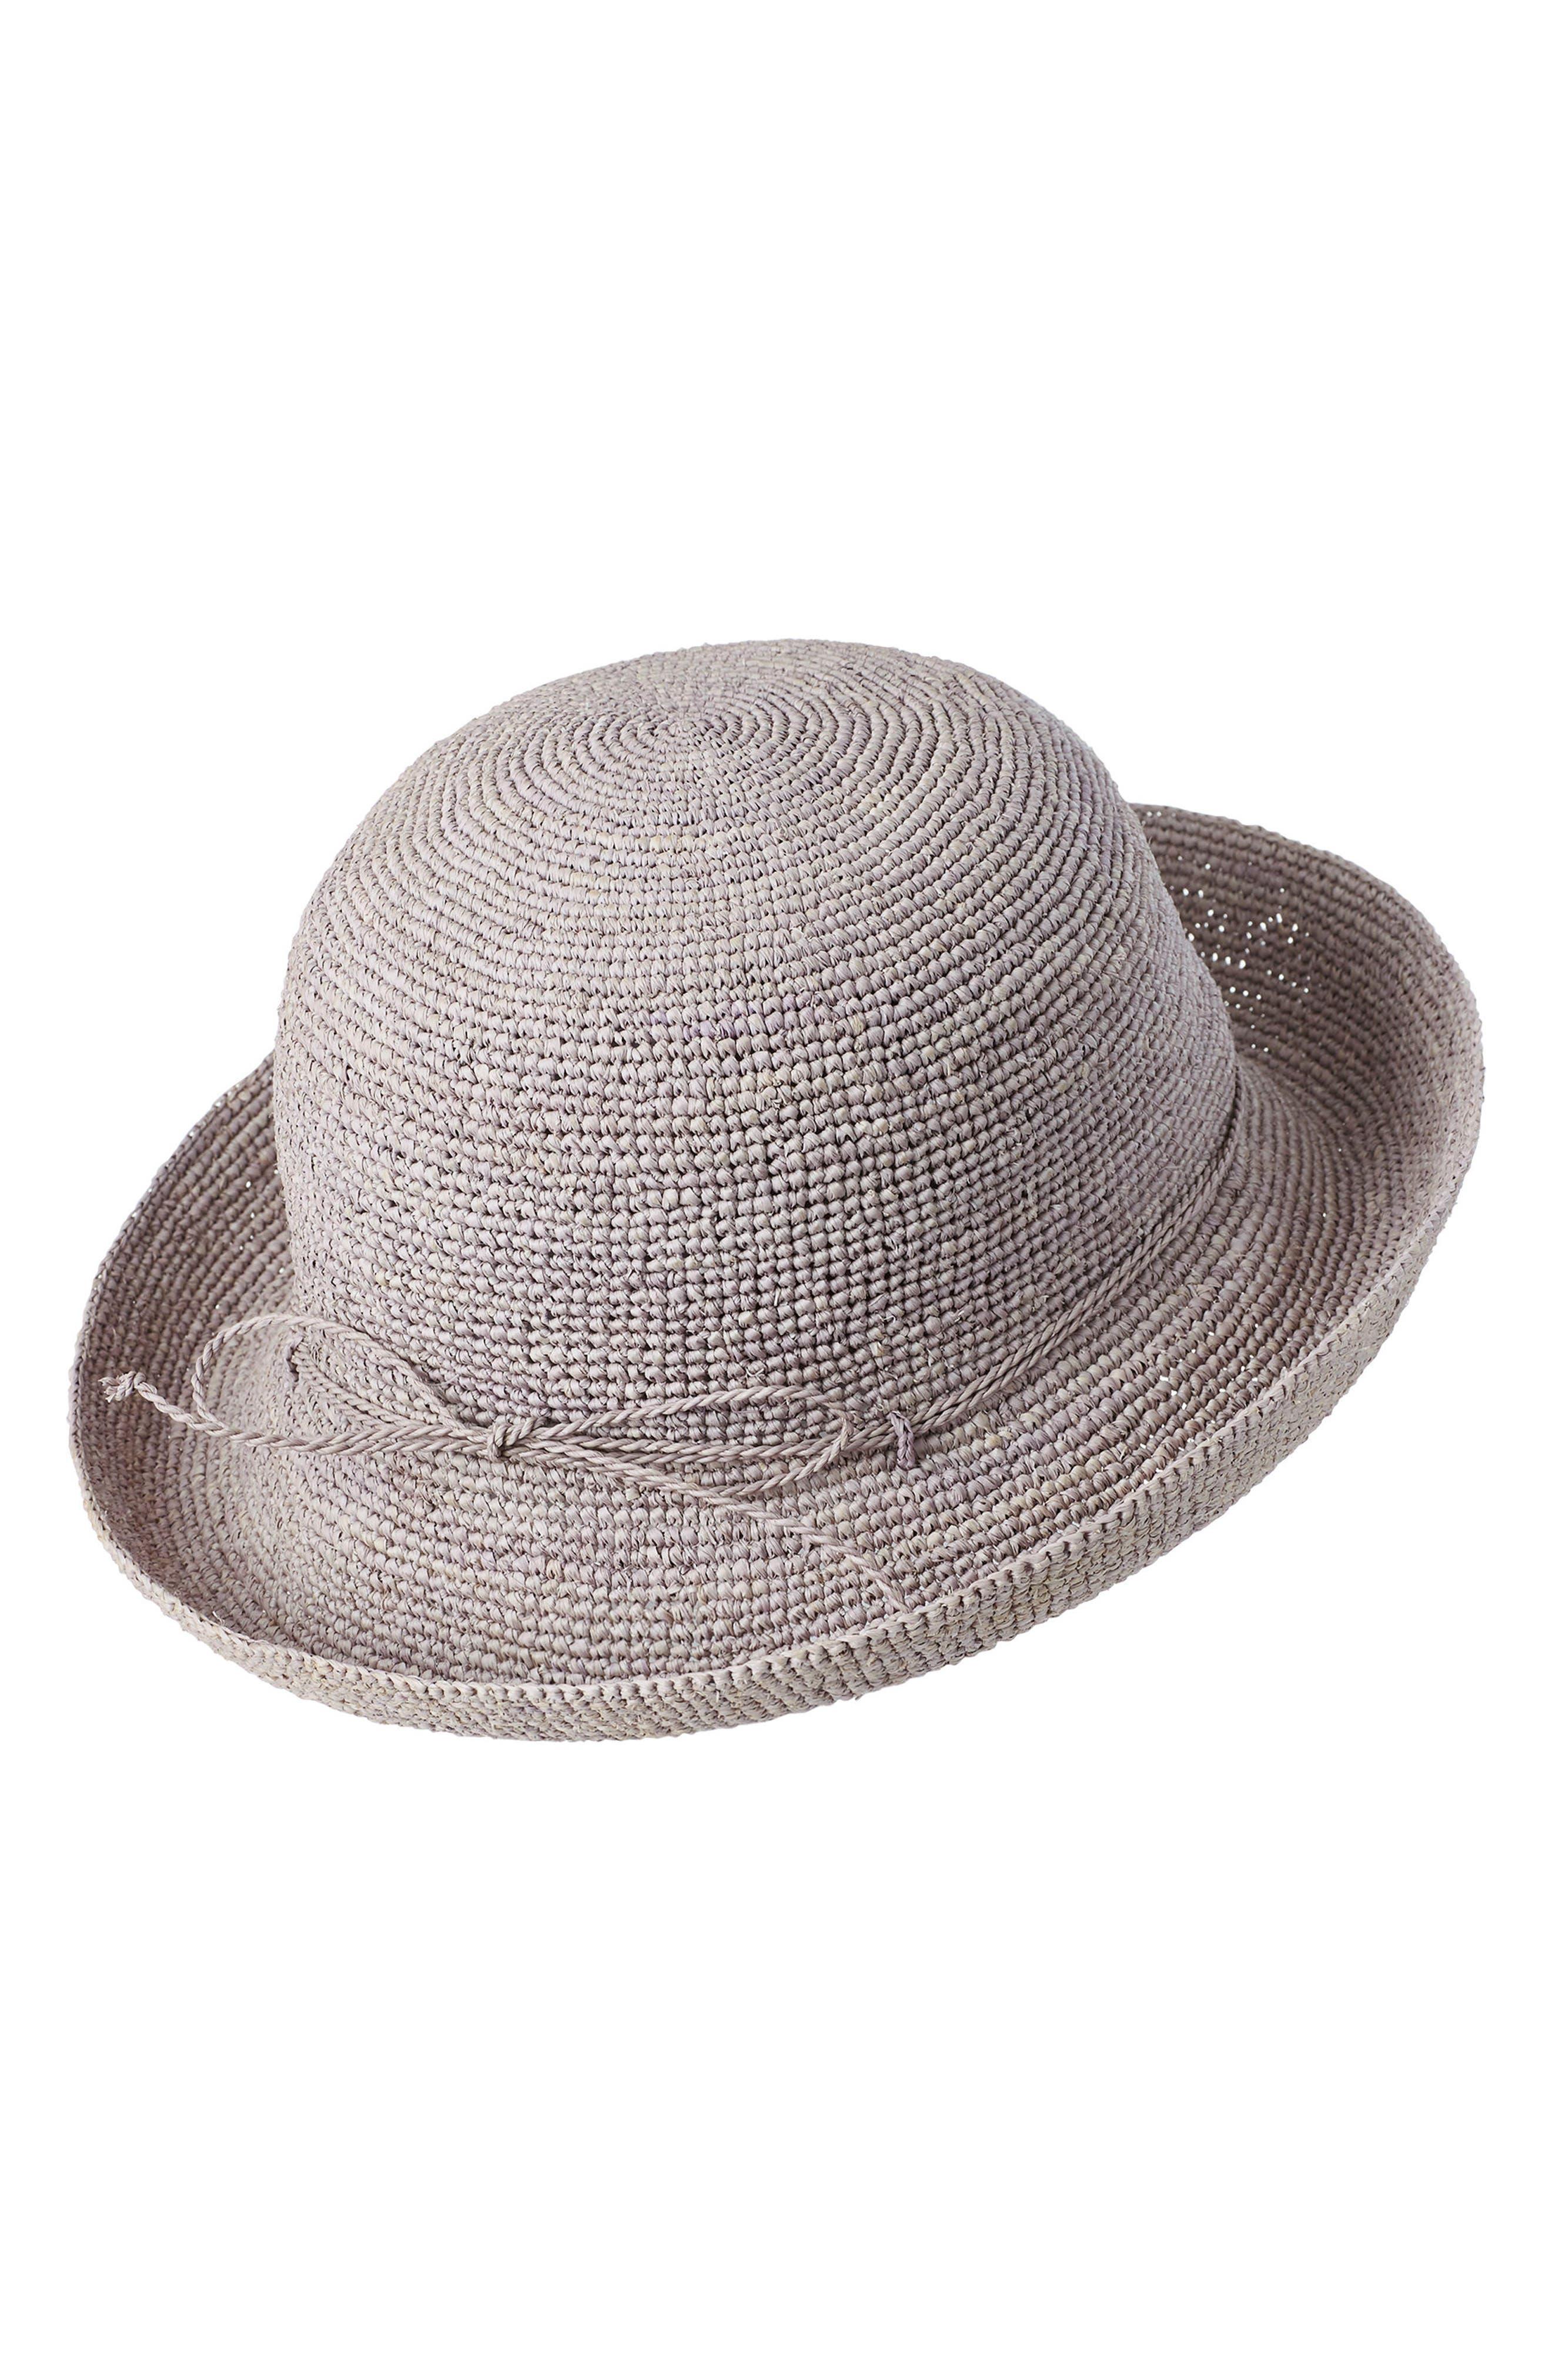 HELEN KAMINSKI CLASSIC UPTURN CROCHETED RAFFIA HAT - GREY